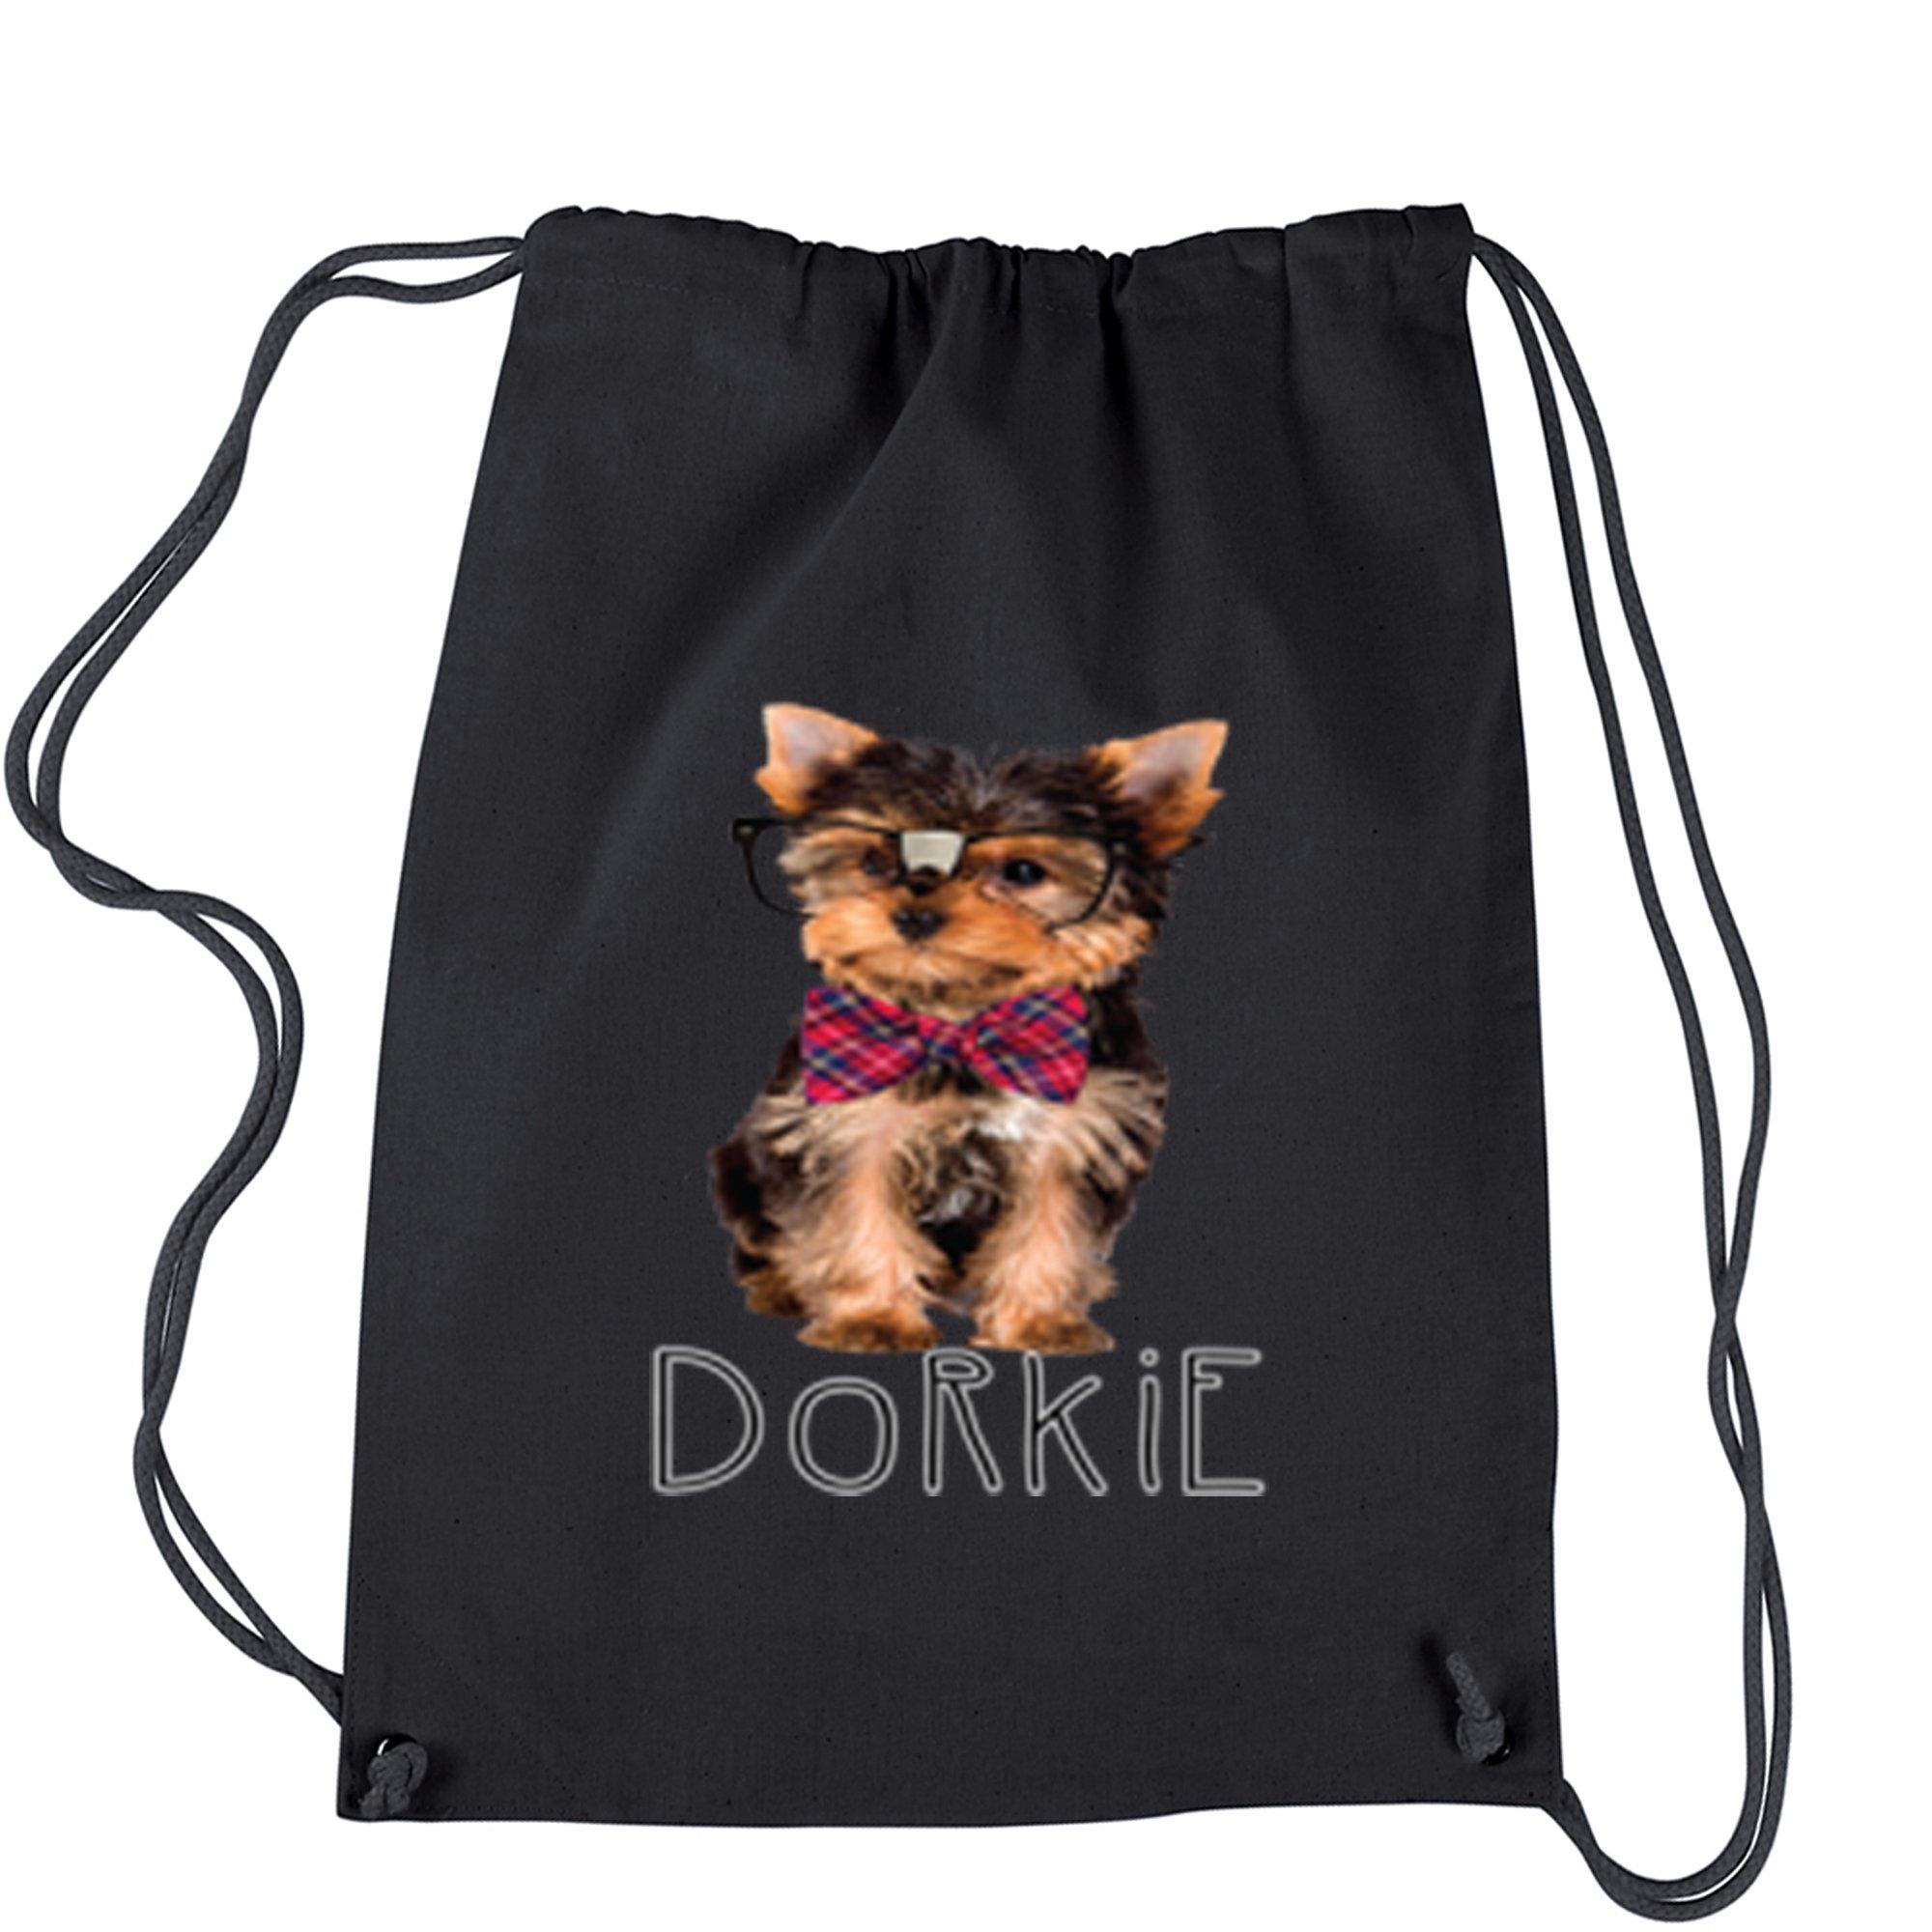 Backpack Dorkie Yorkie With Glasses Black Drawstring Backpack